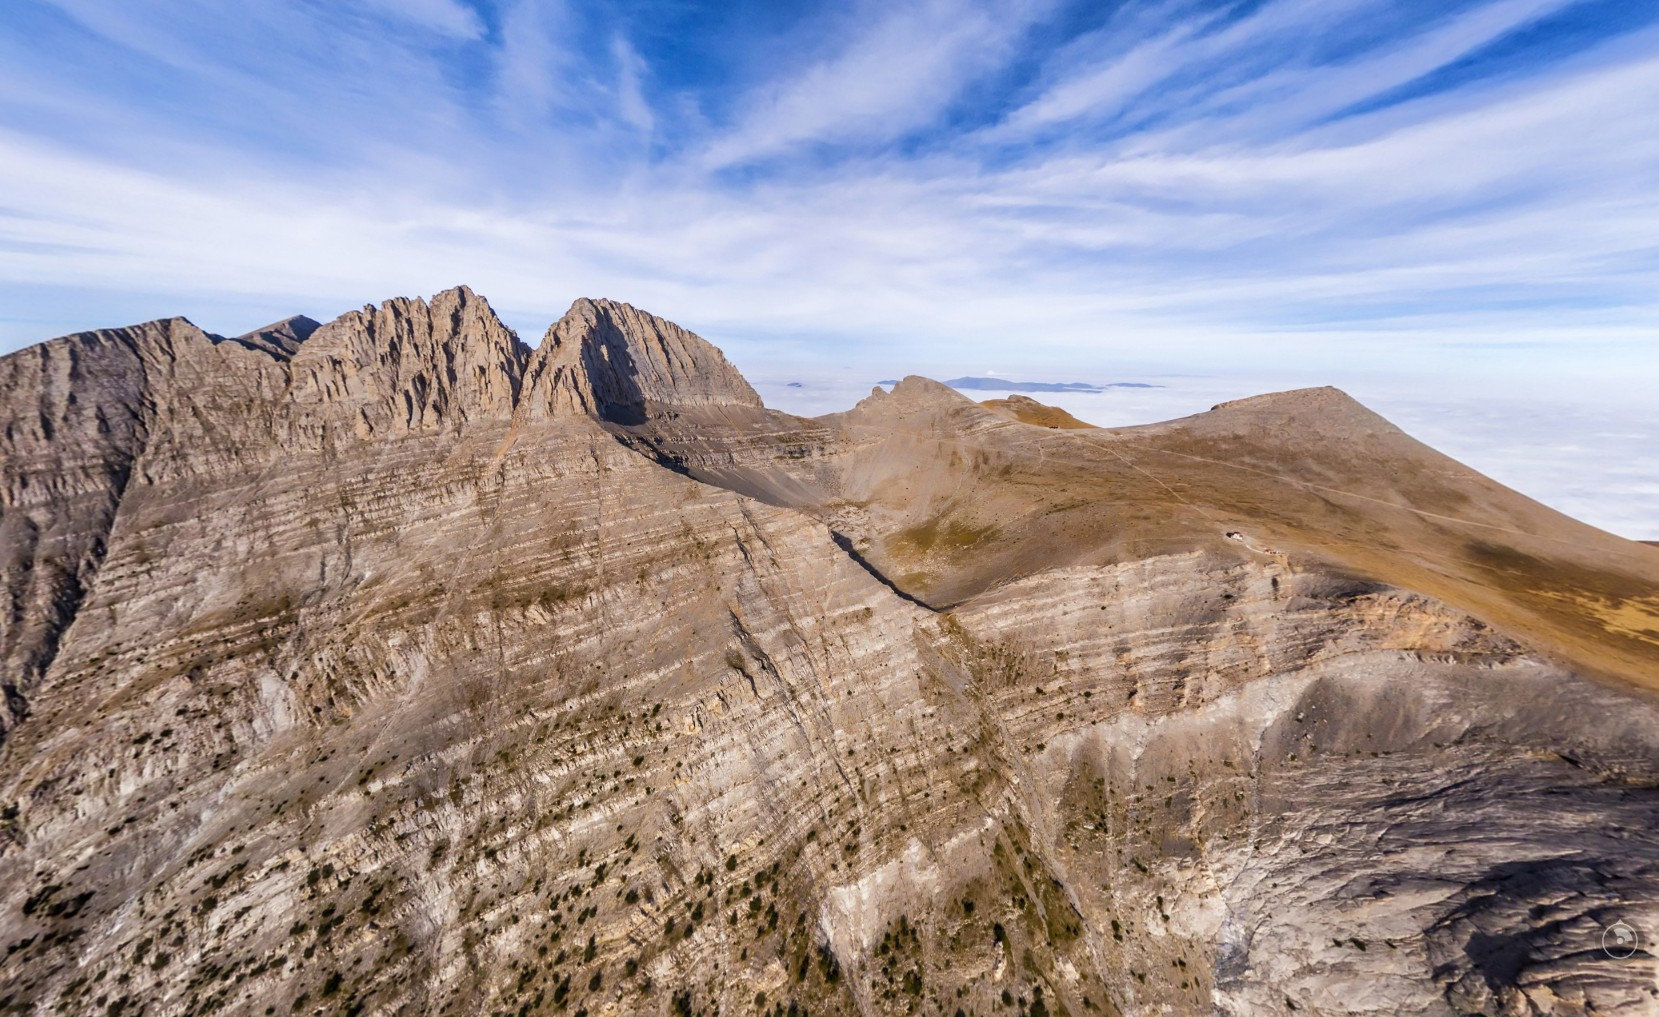 one day - Climbing to summit Mytikas